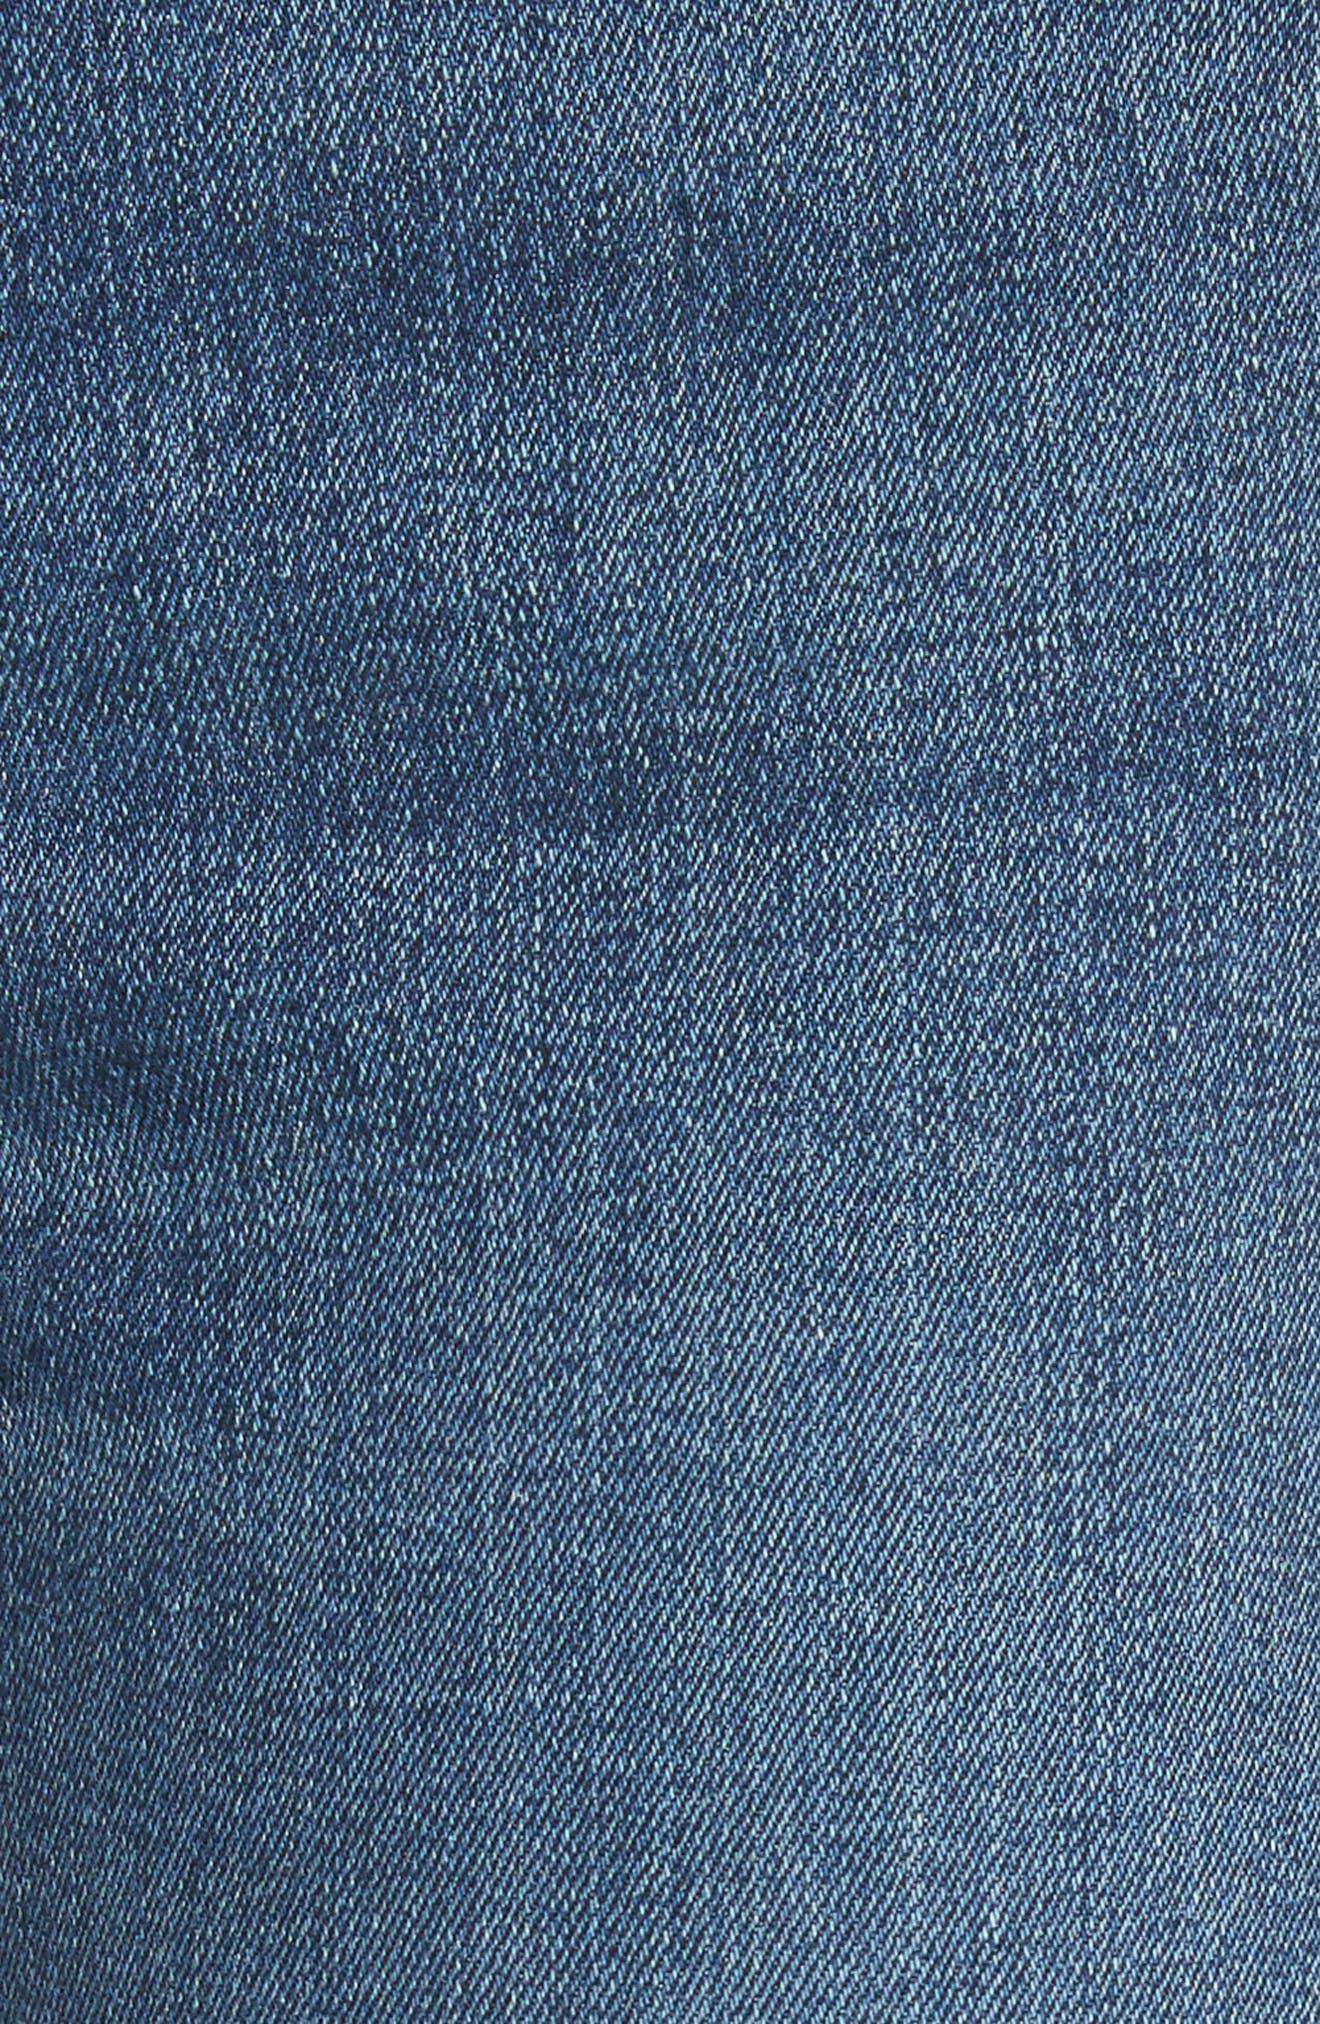 Kate Crop Skinny Jeans,                             Alternate thumbnail 5, color,                             400